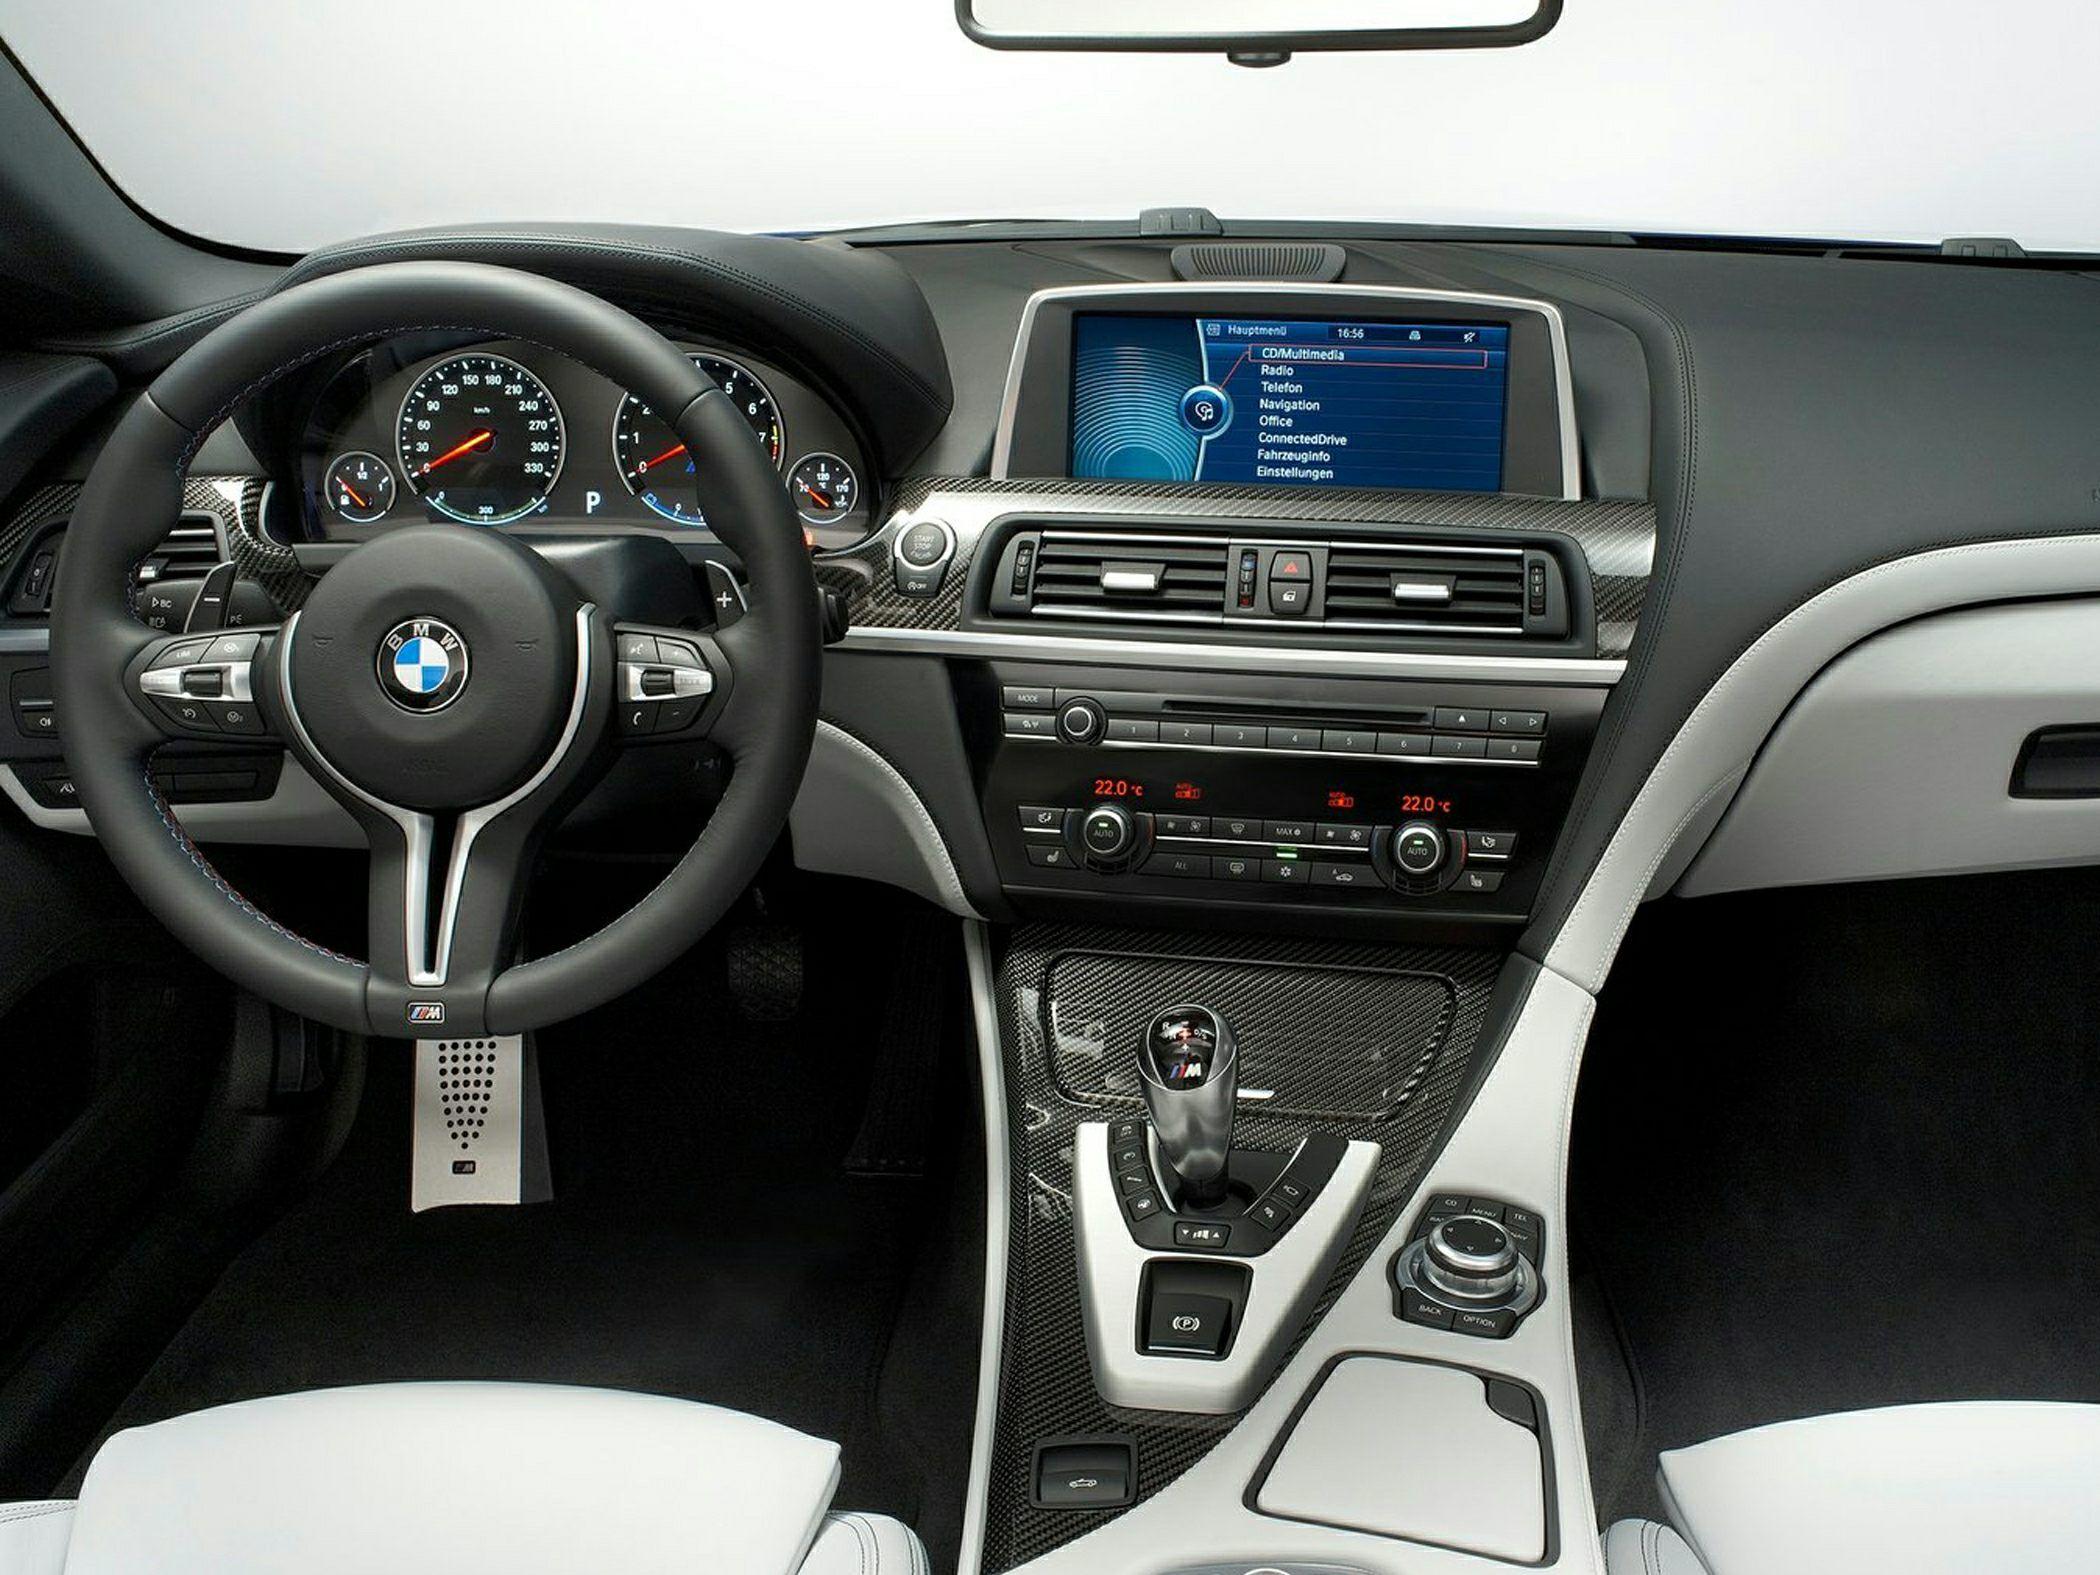 Love the new 2012 bmw interior